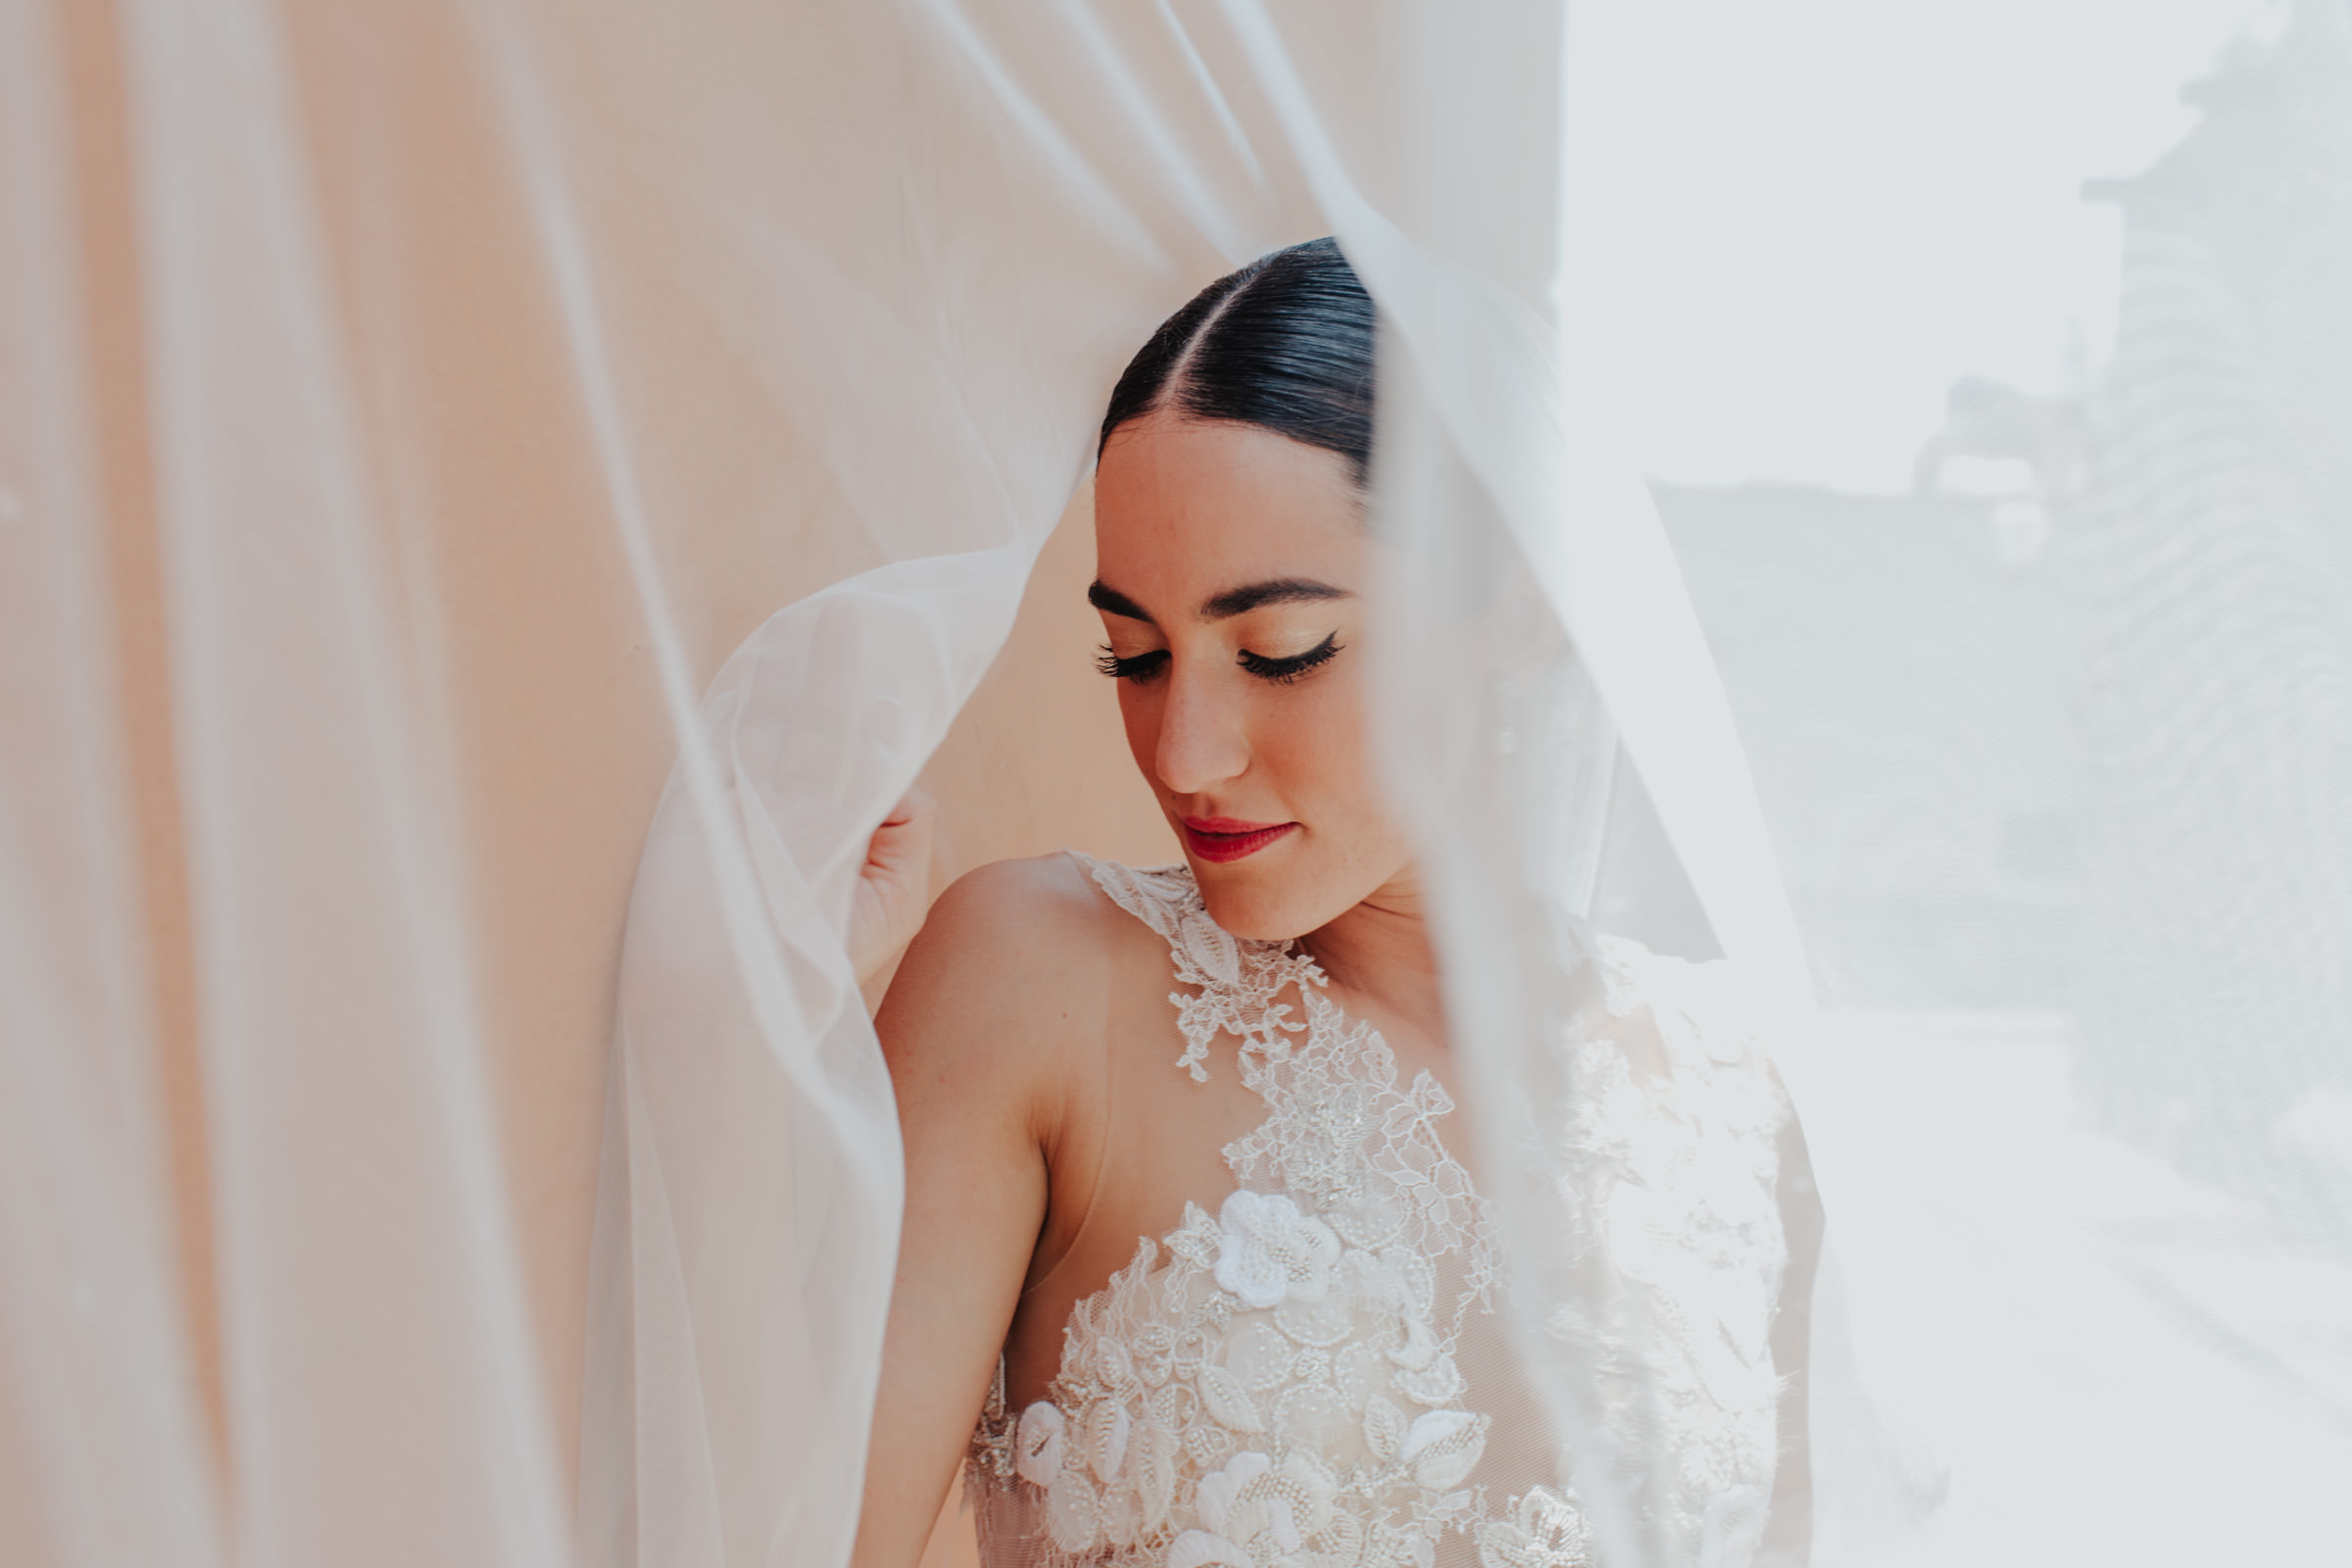 San-Miguel-de-Allende-Wedding-Photography-Parroquia-Instituto-Boda-Fotografia-Fer-Sergio-Pierce-Lifestyle-Photography0228.JPG